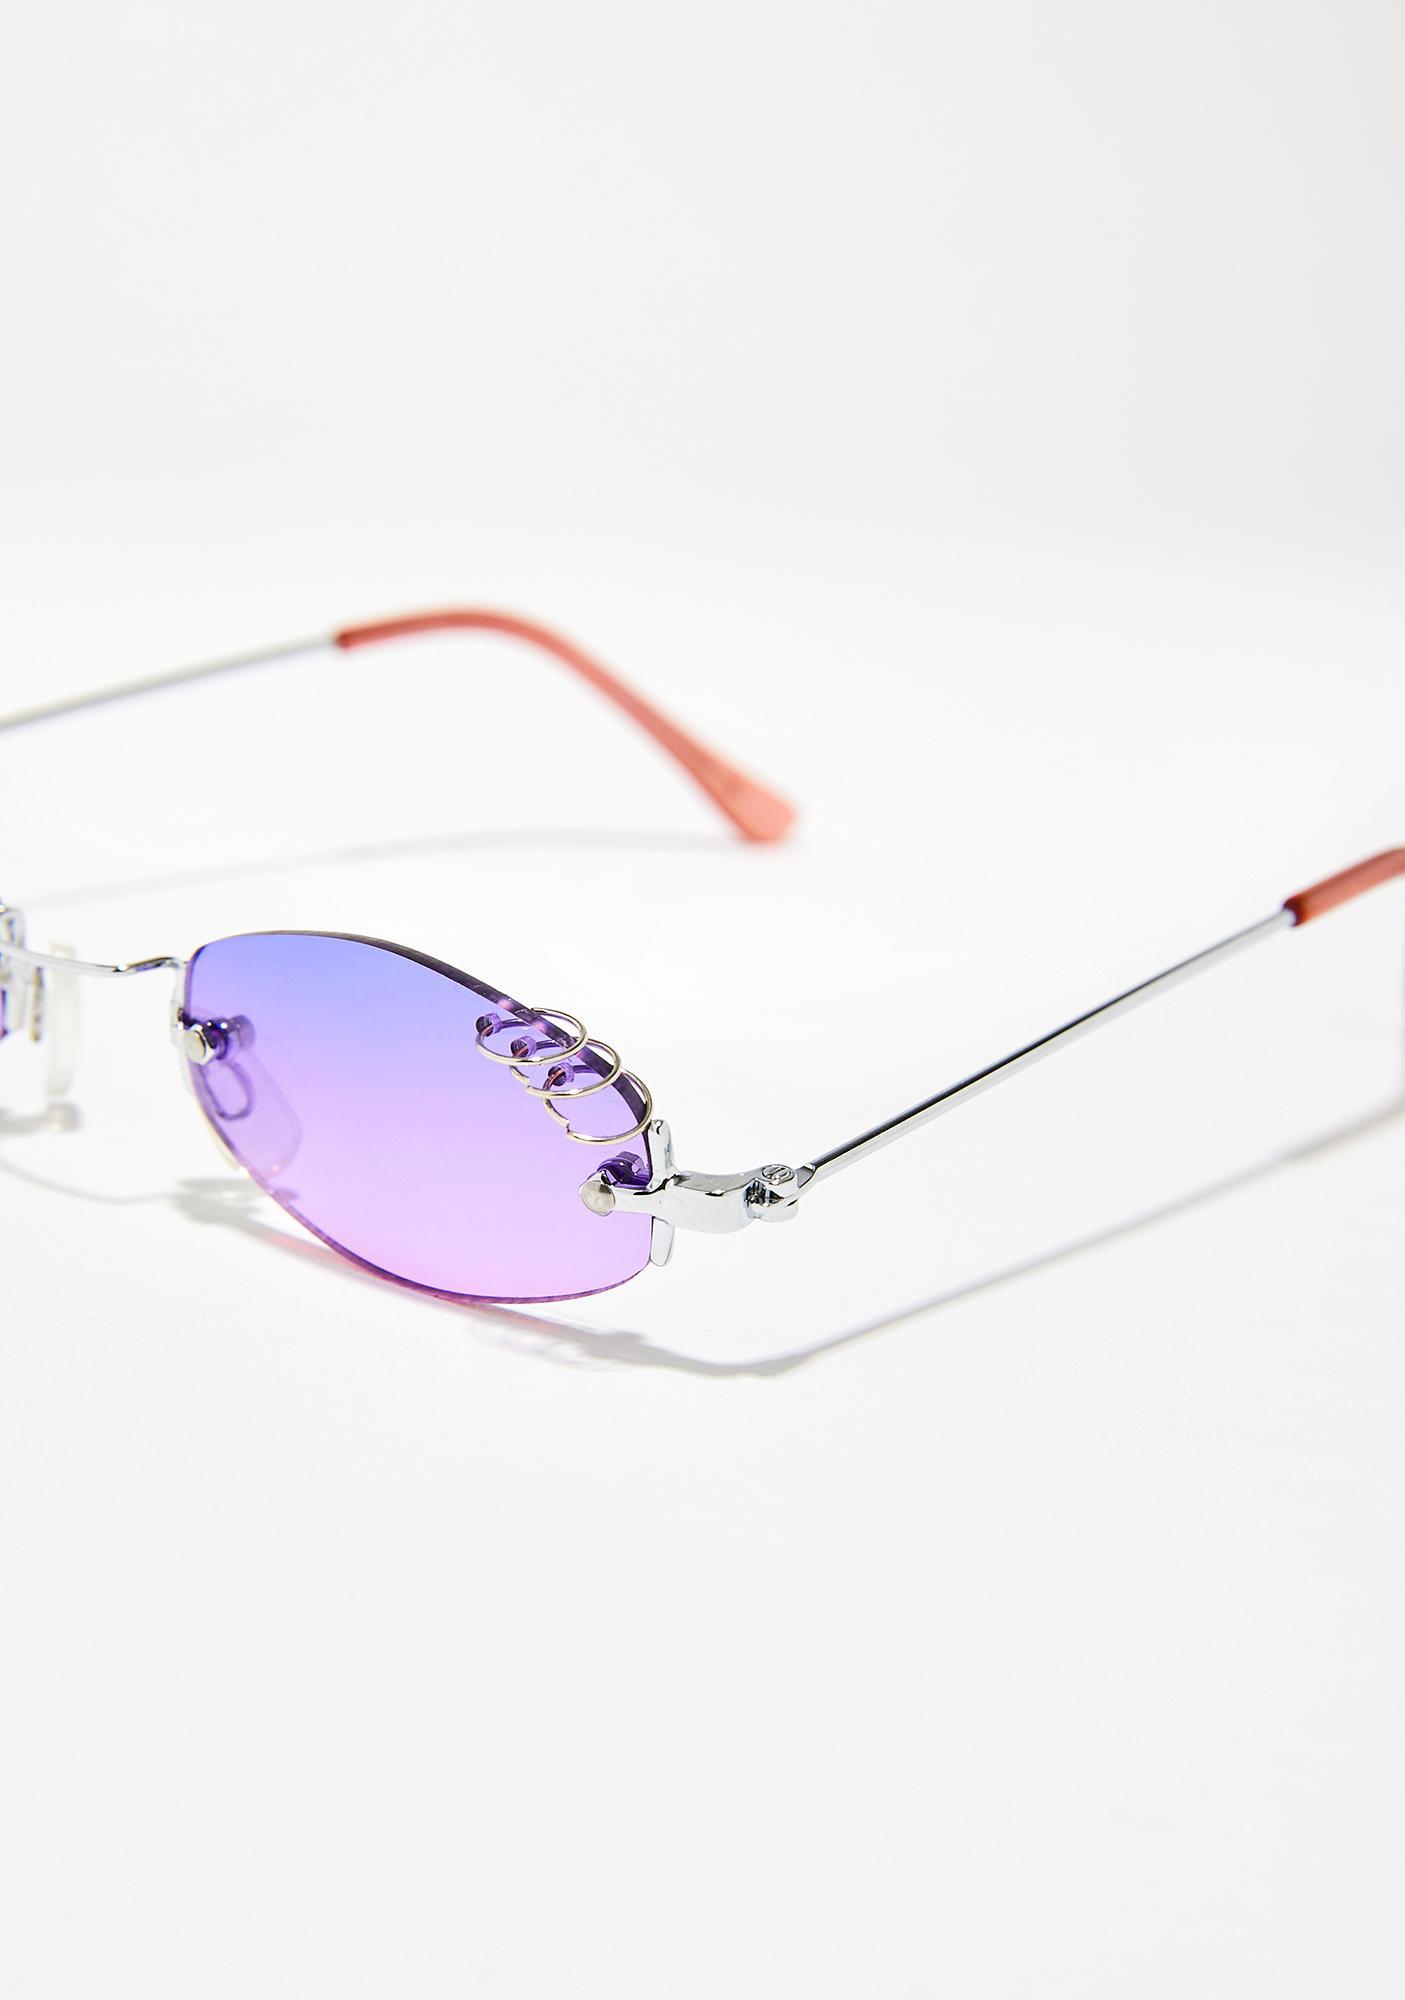 Lilac Clout Queen Pierced Sunglasses